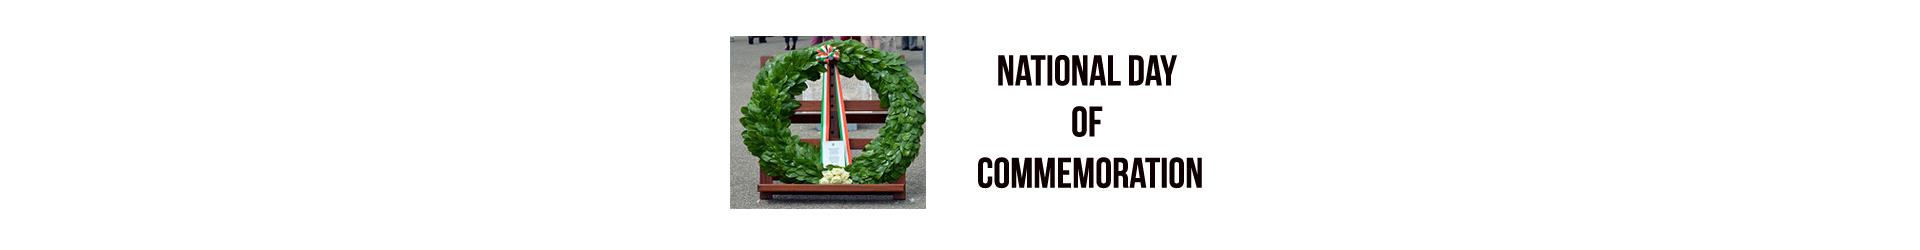 National Day of Commemoration – Sunday 08 July 2018